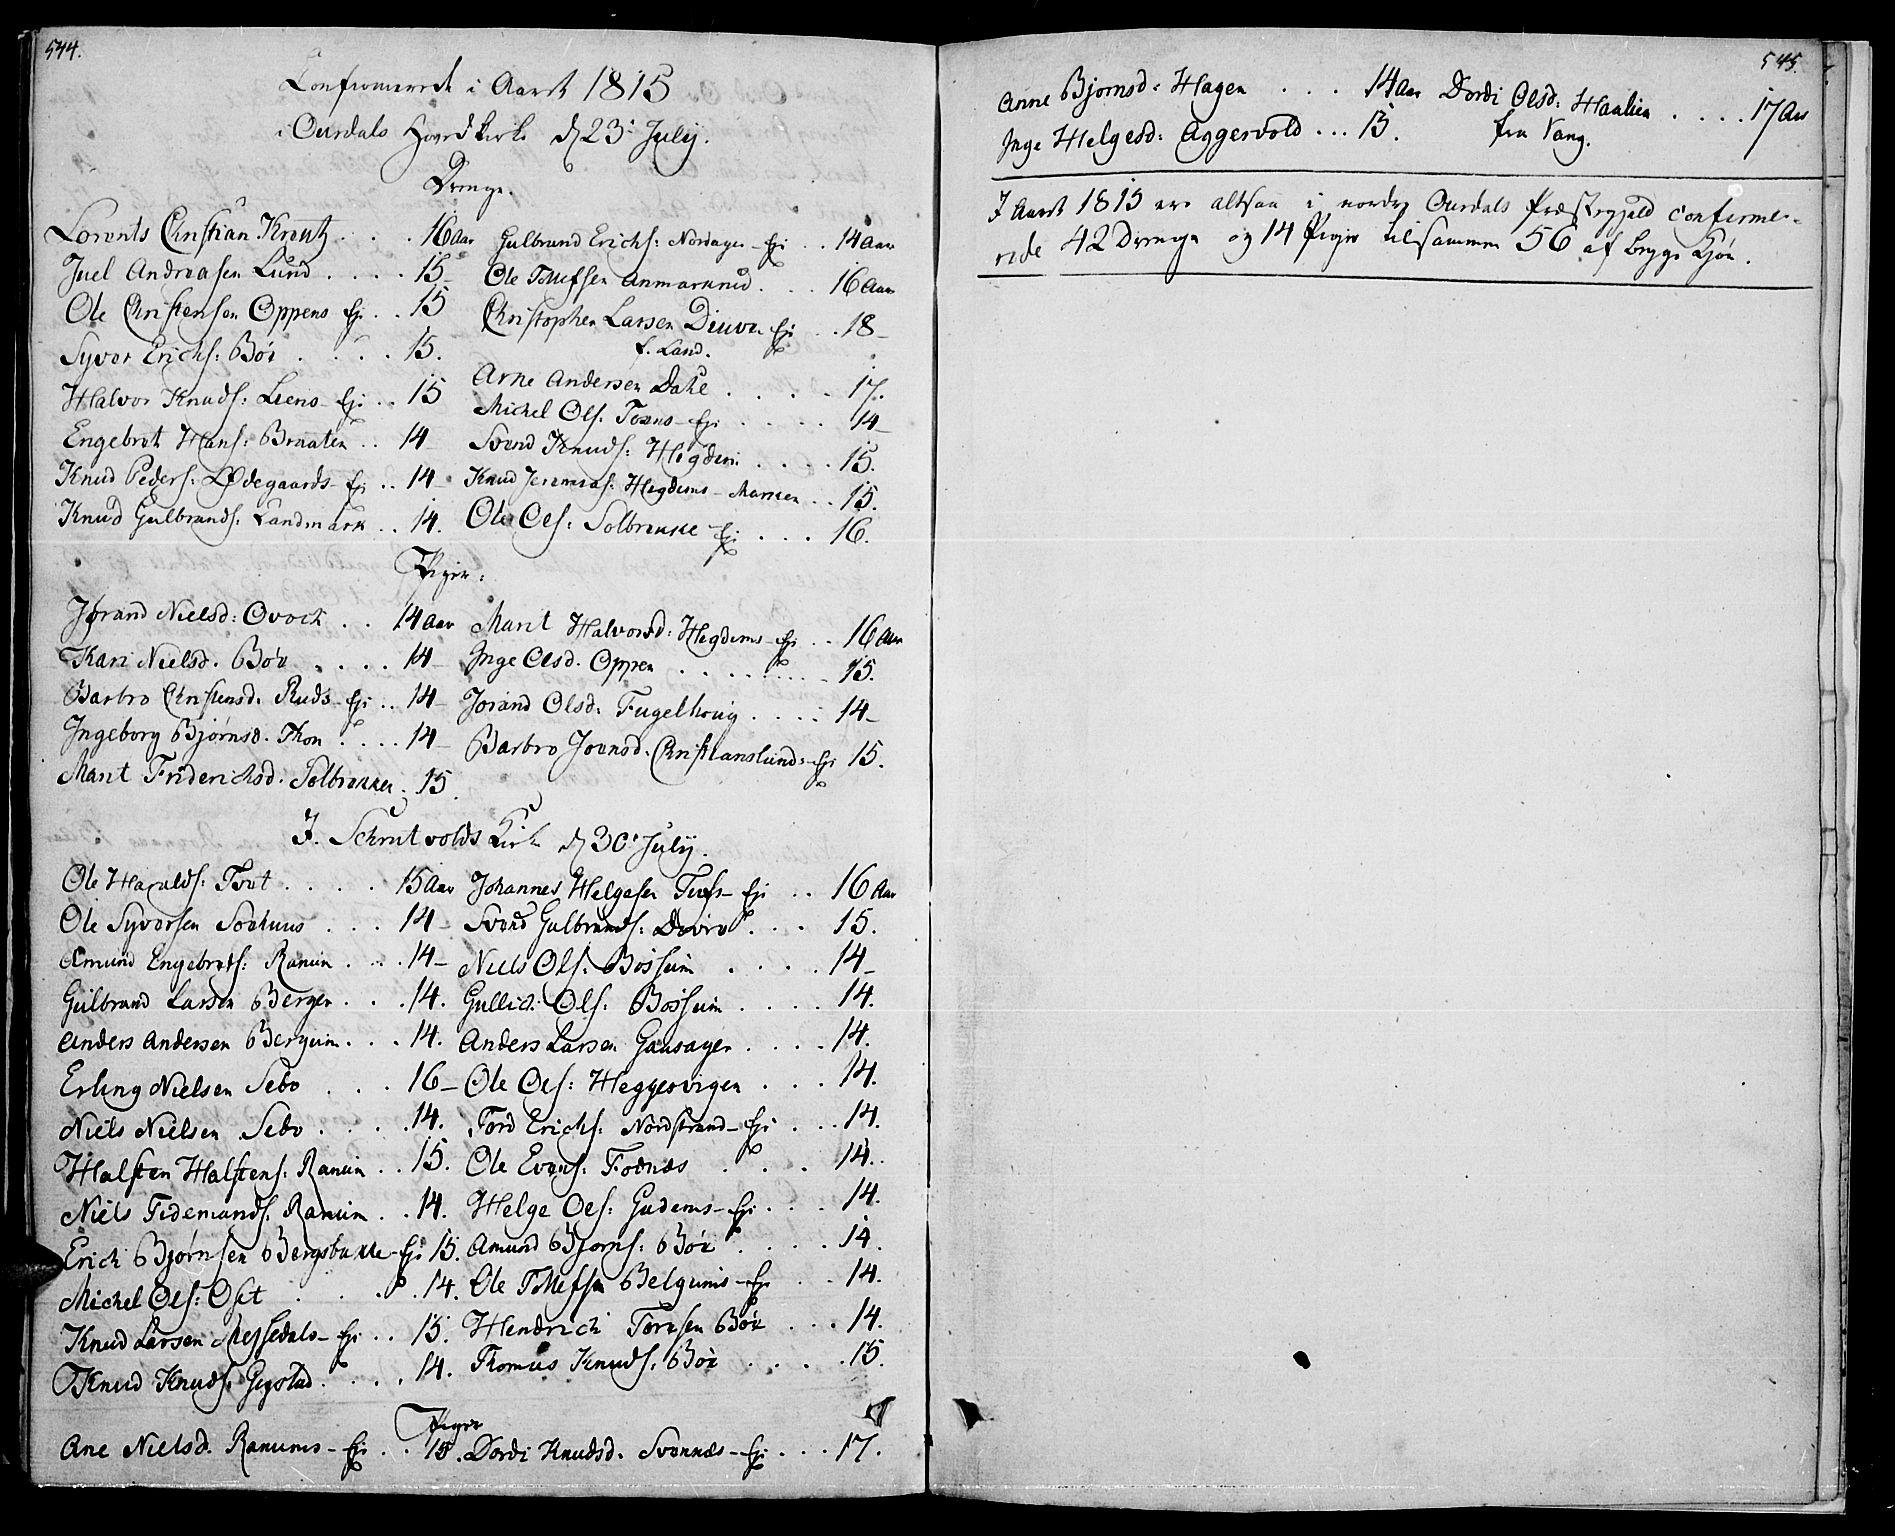 SAH, Nord-Aurdal prestekontor, Ministerialbok nr. 1, 1808-1815, s. 544-545